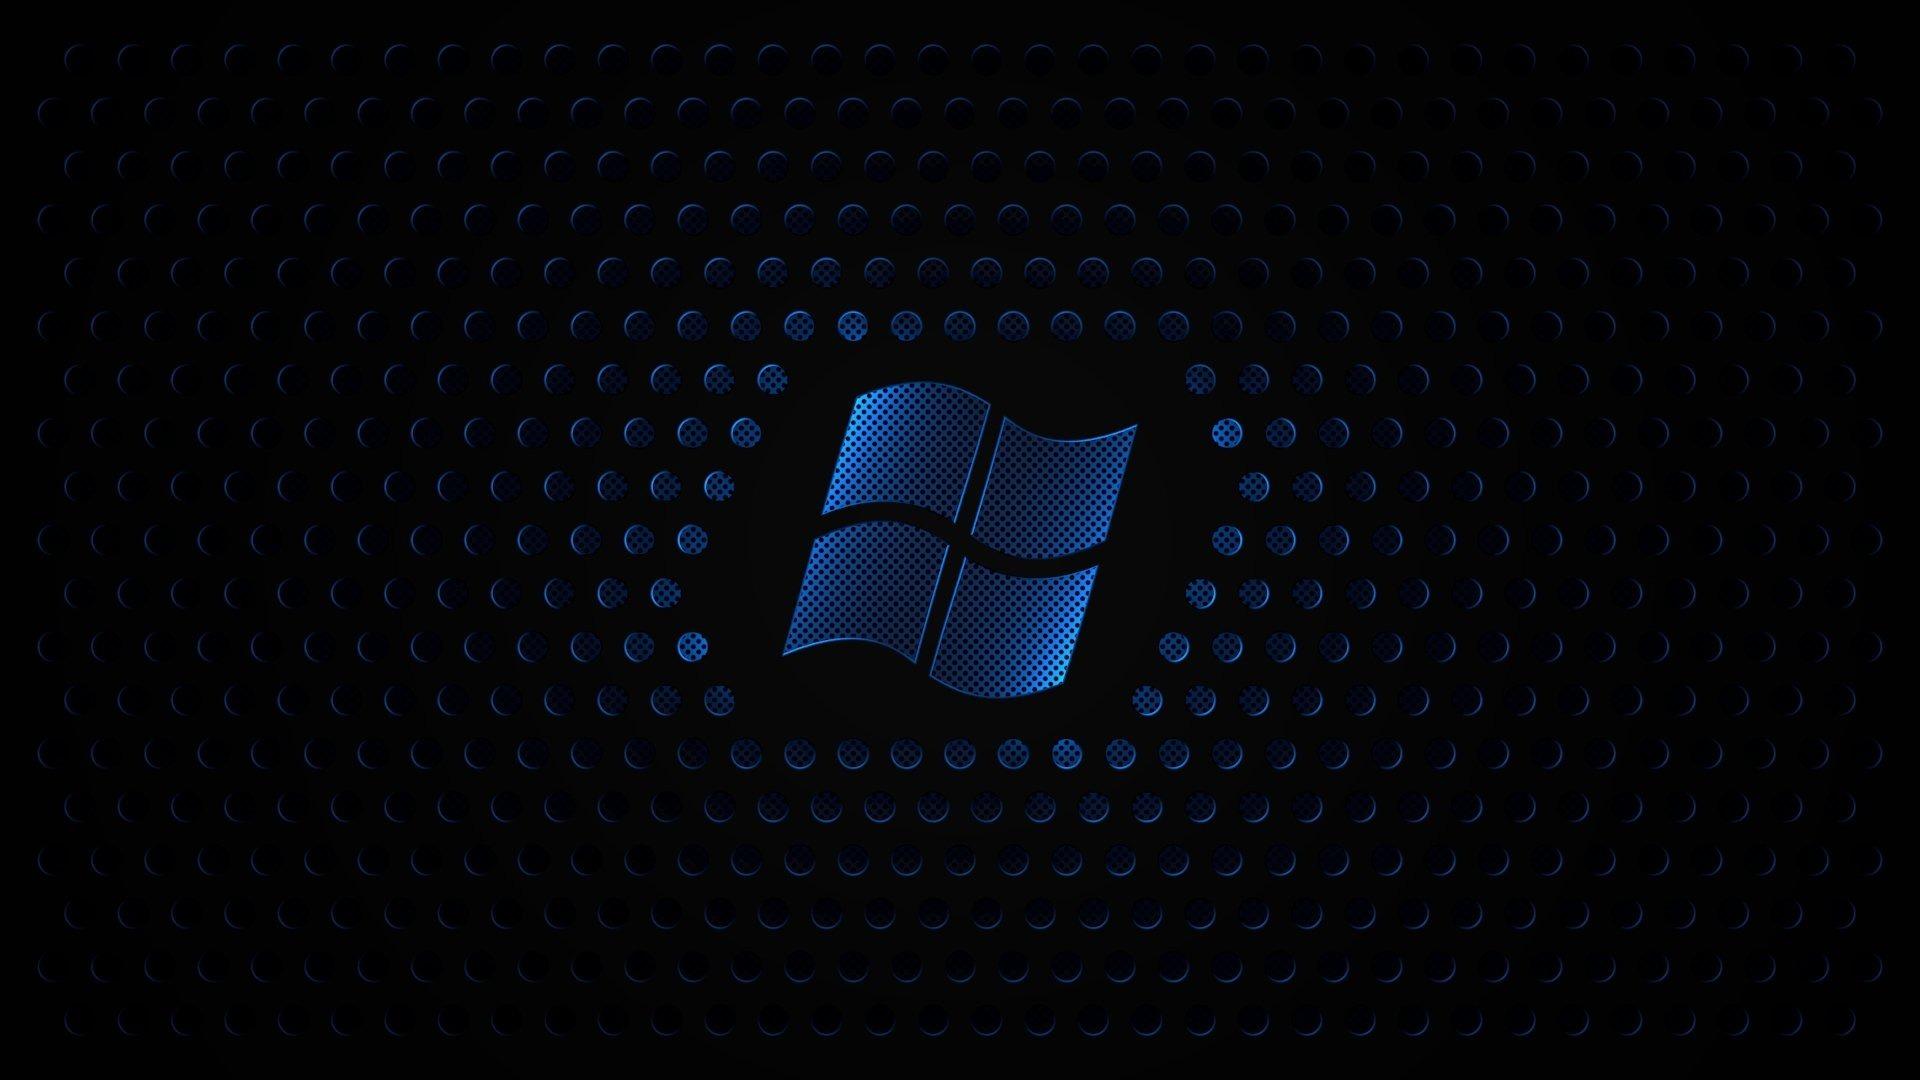 windows 7 wallpapers hd top technology images windows hd wallpaperjpg 1920x1080